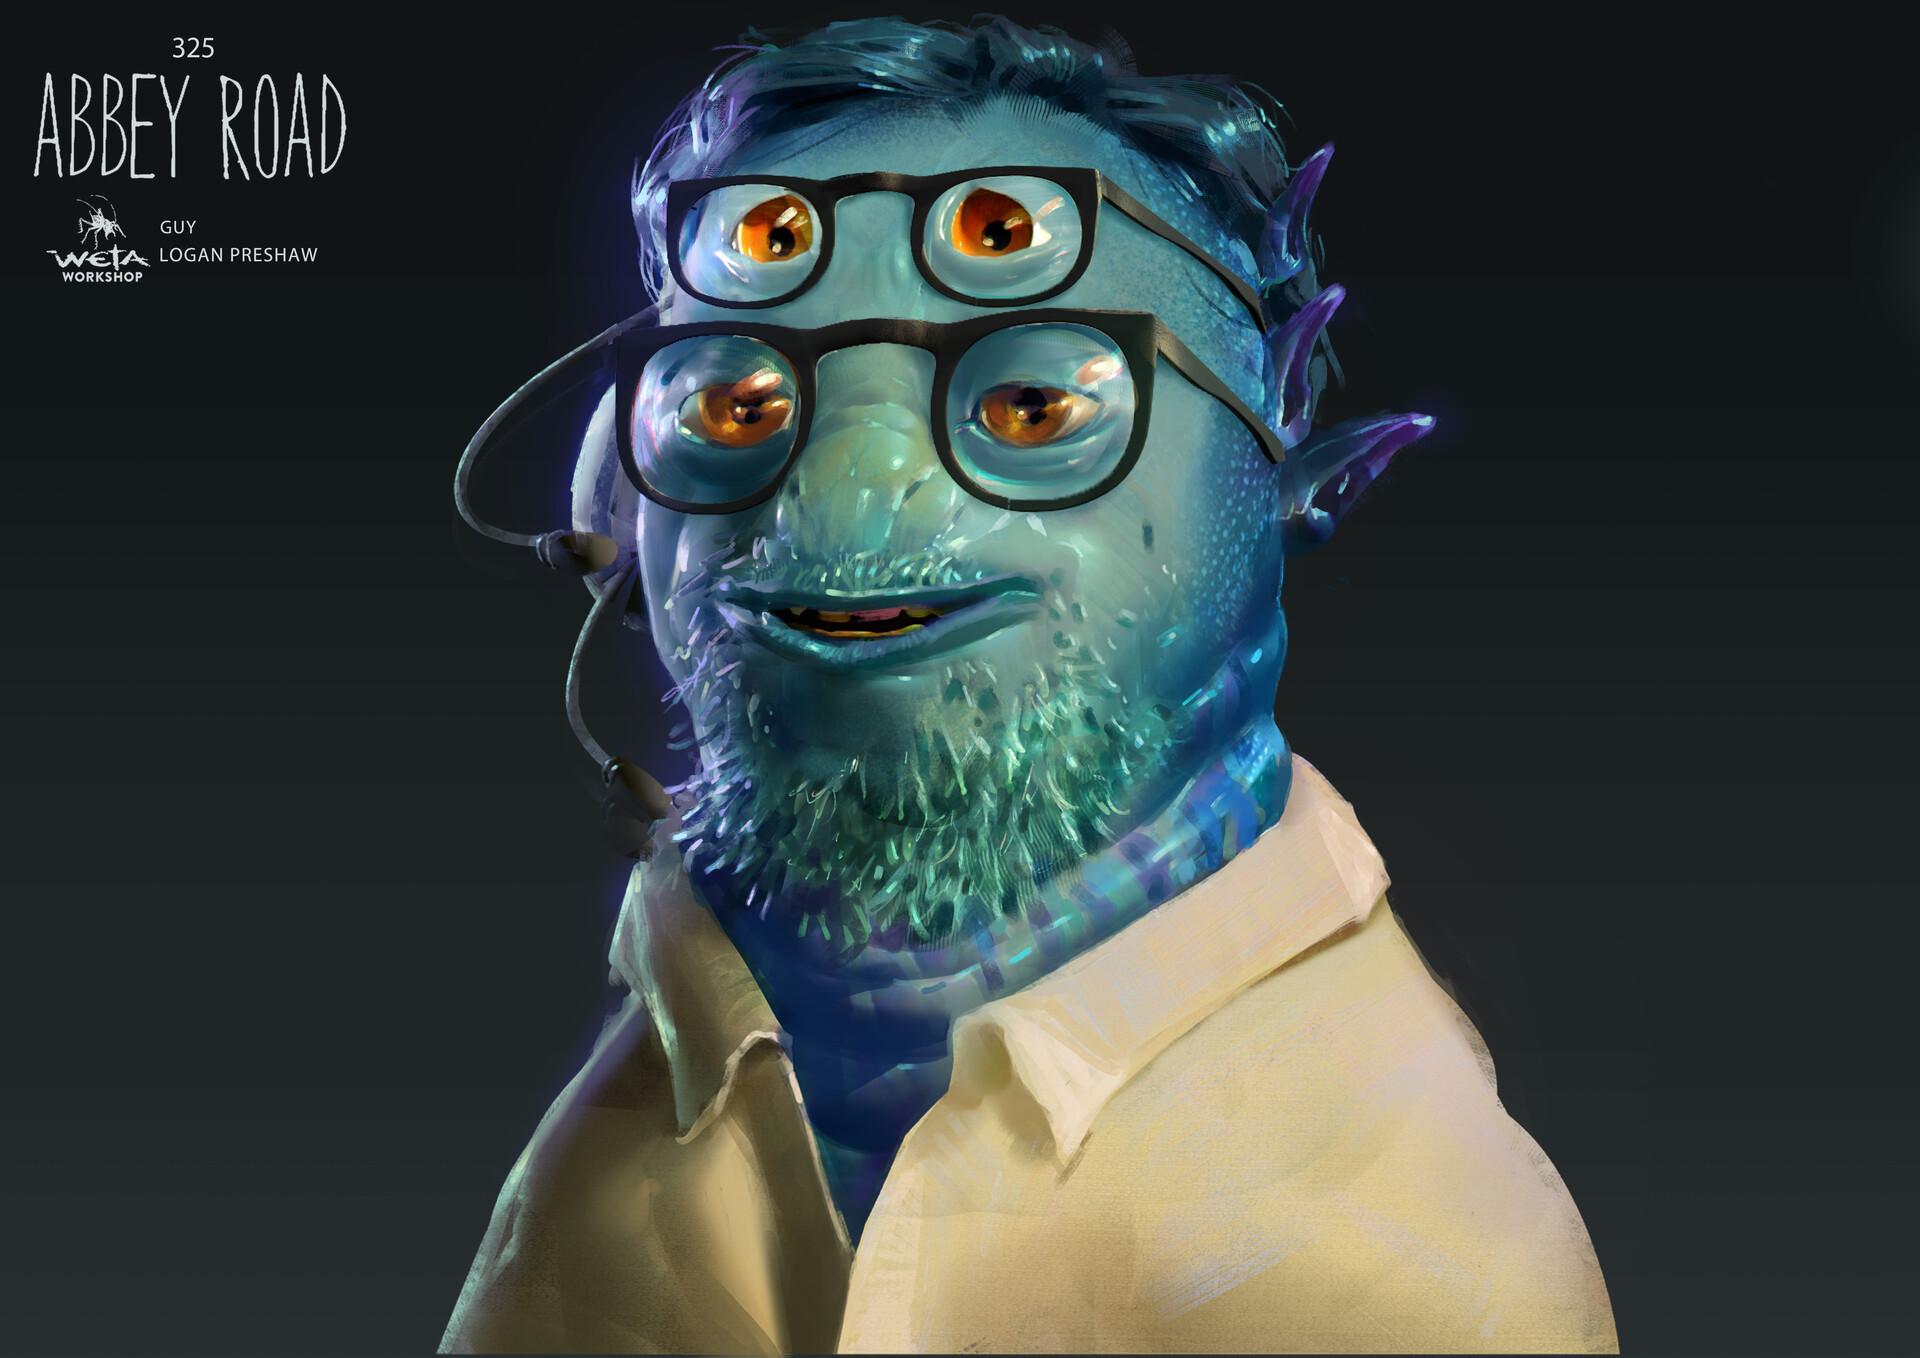 Alien Guy - Artist: Logan Preshaw